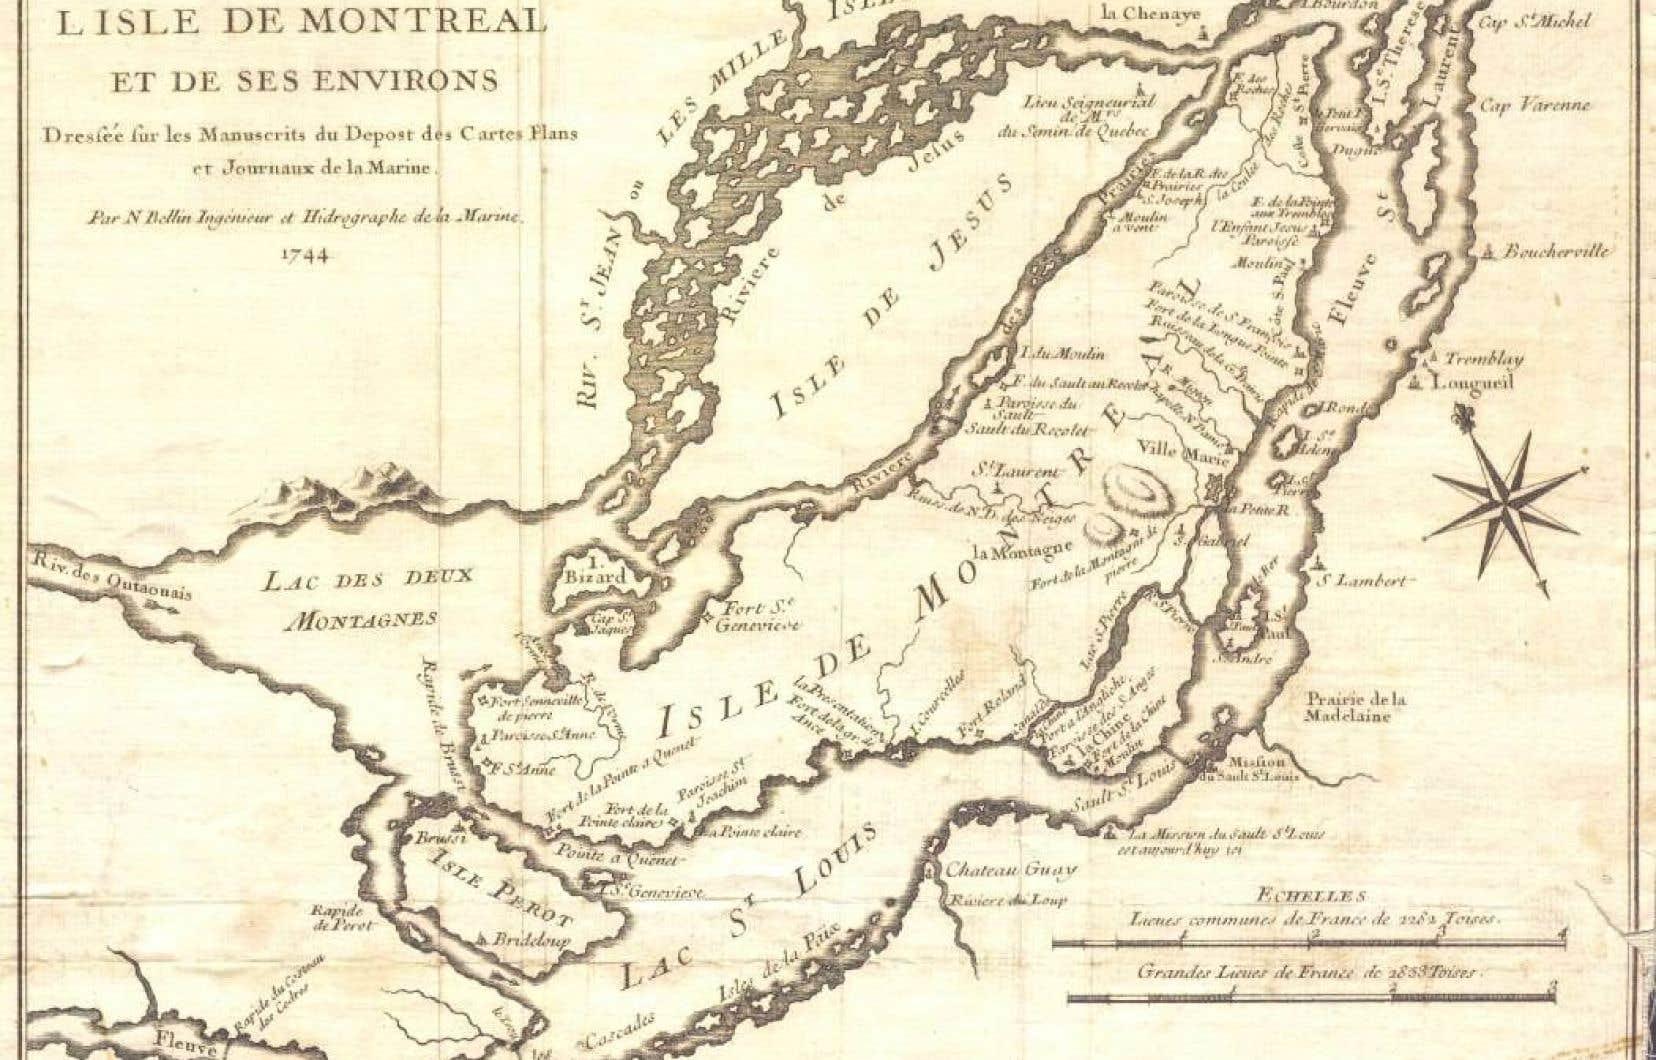 Carte de N. Bellin, ingénieur et hidrographe de la Marine (1744)